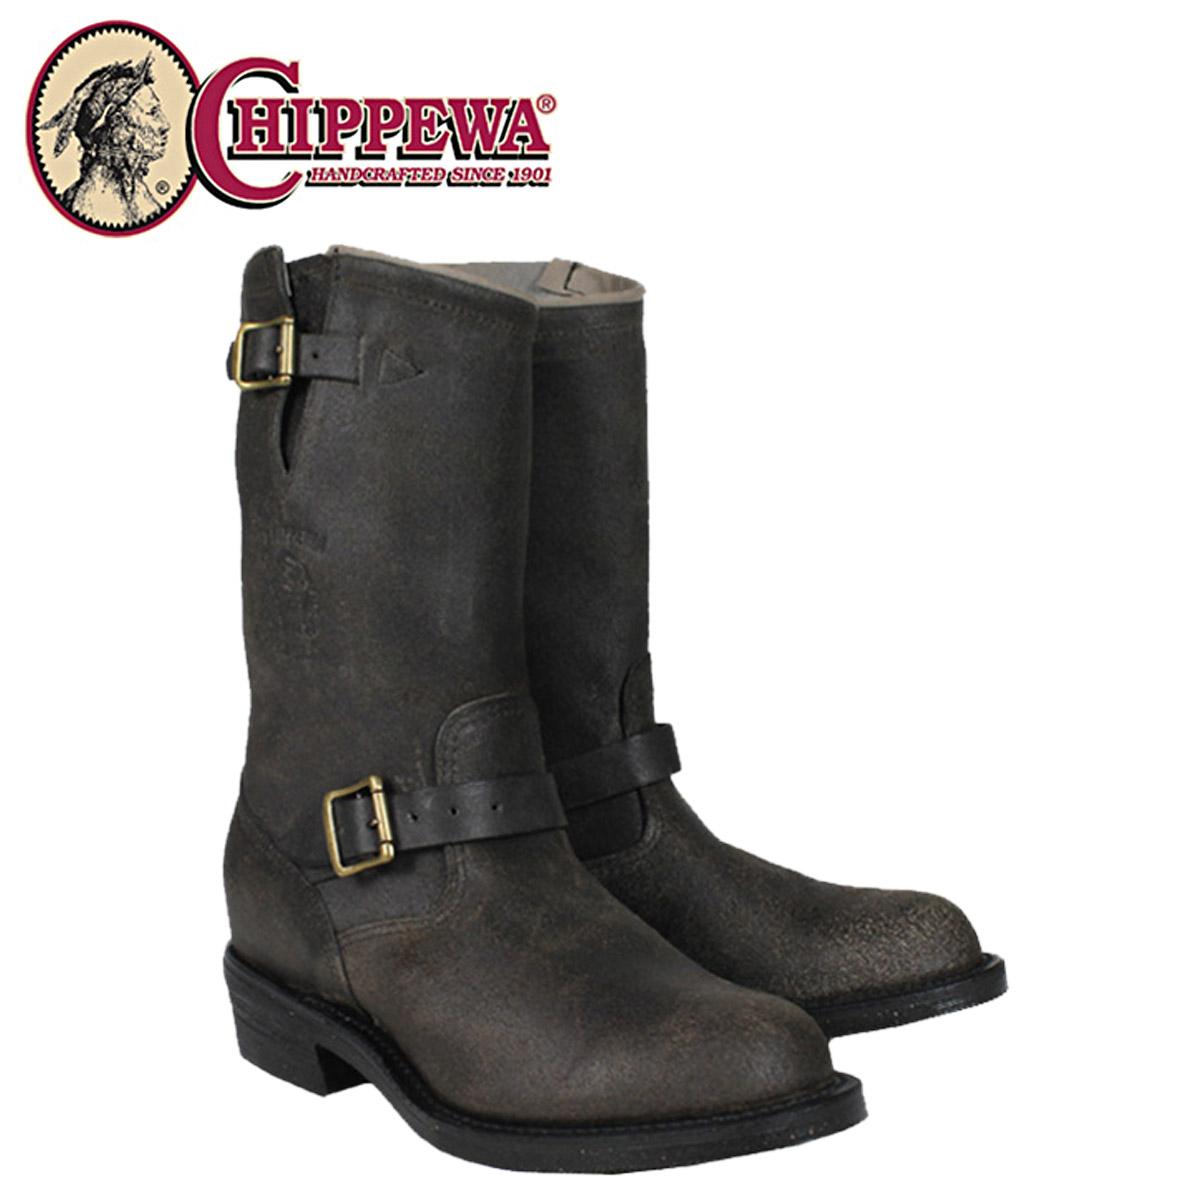 b32c56add7d96 Closing sale points 10 times Chippewa CHIPPEWA 11 inch black bomber jacket  engineer 27921  Black  11 INCH BLACK BOMBER JACKETENGINEER D wise E wise  leather ...